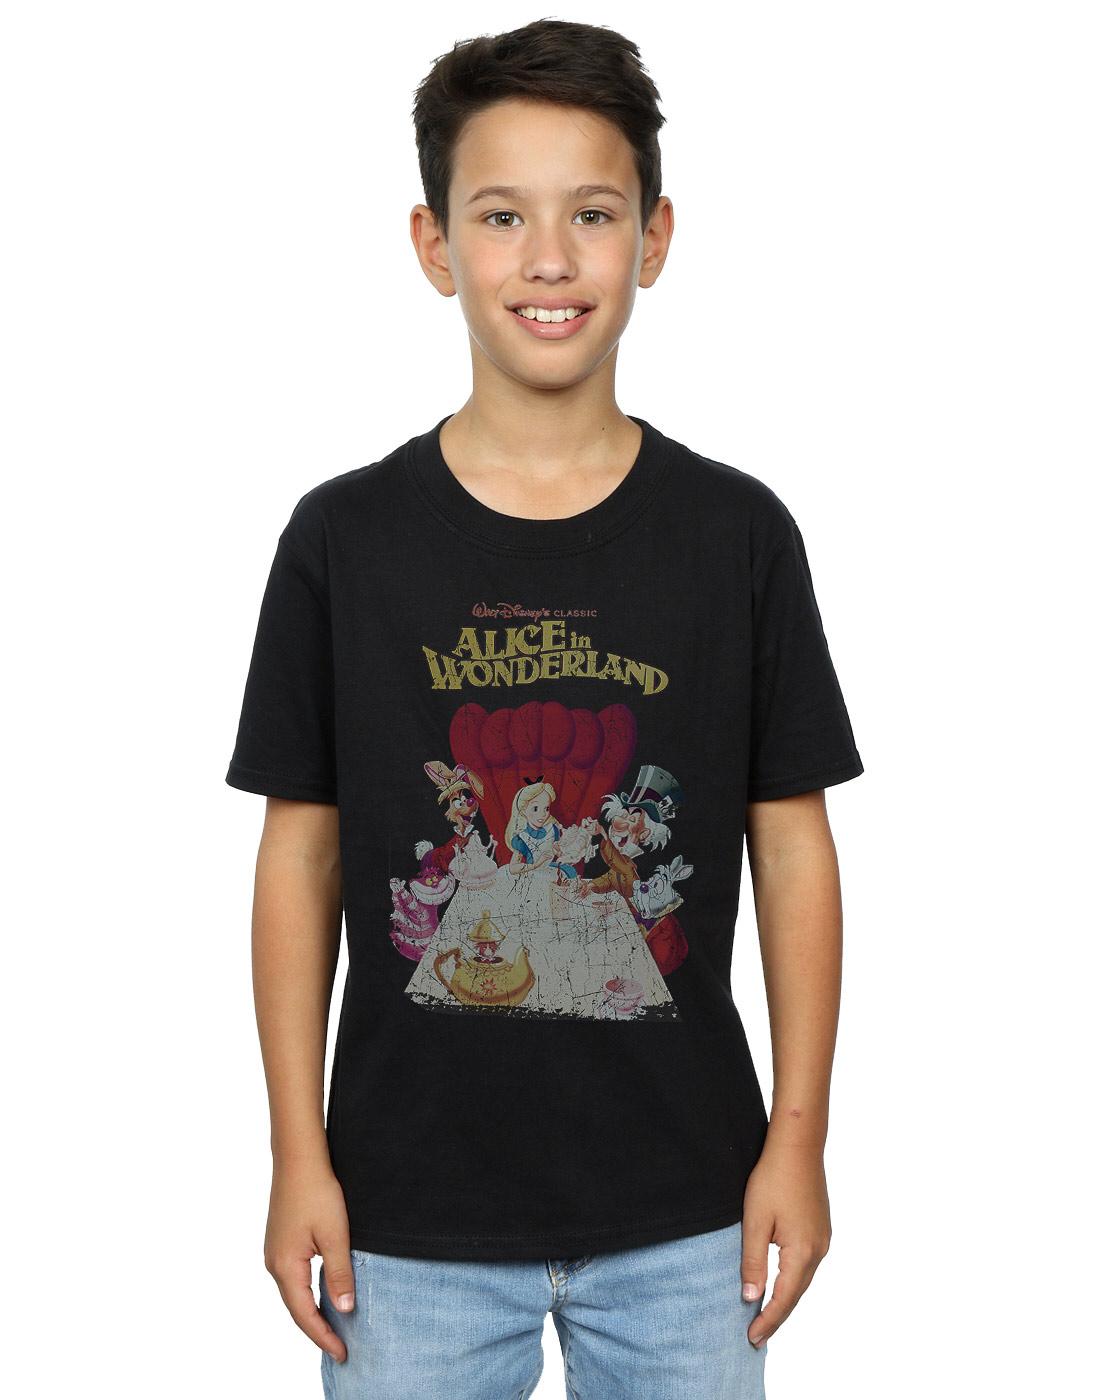 Disney-Jungen-Alice-In-Wonderland-Retro-Poster-T-Shirt